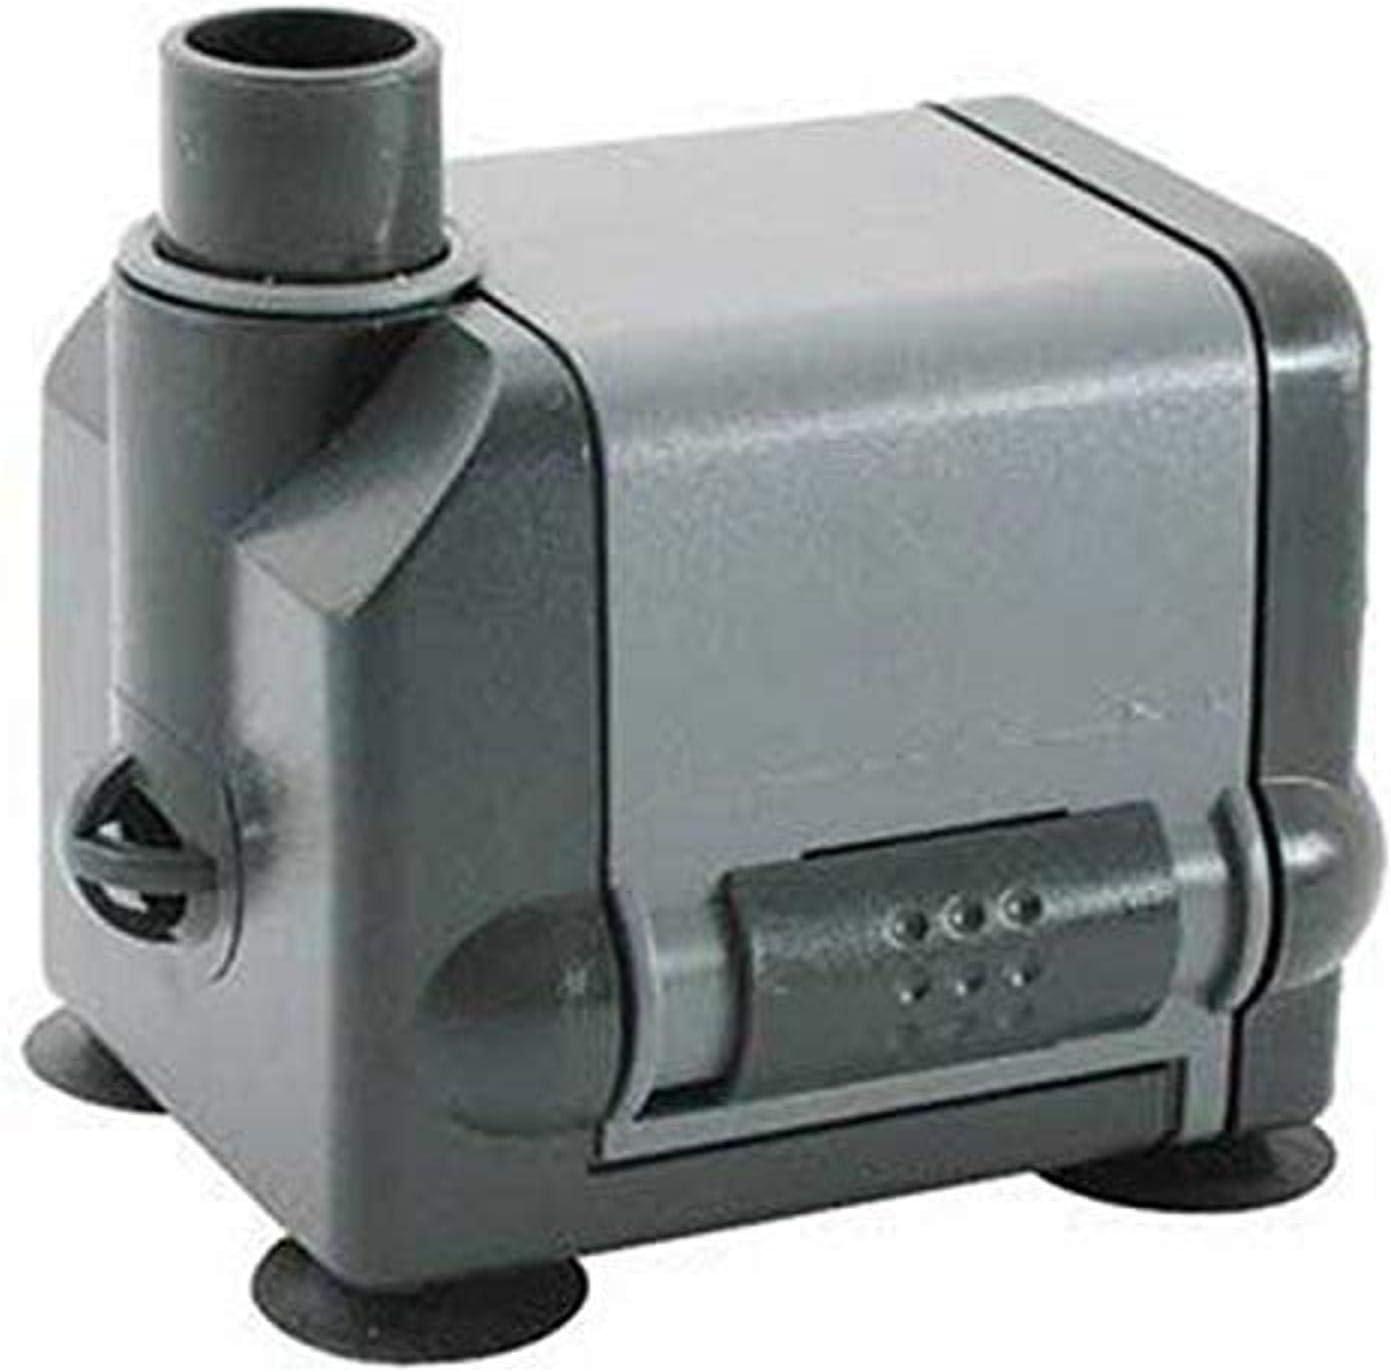 Sicce Micra Aquarium Pump, 90gph